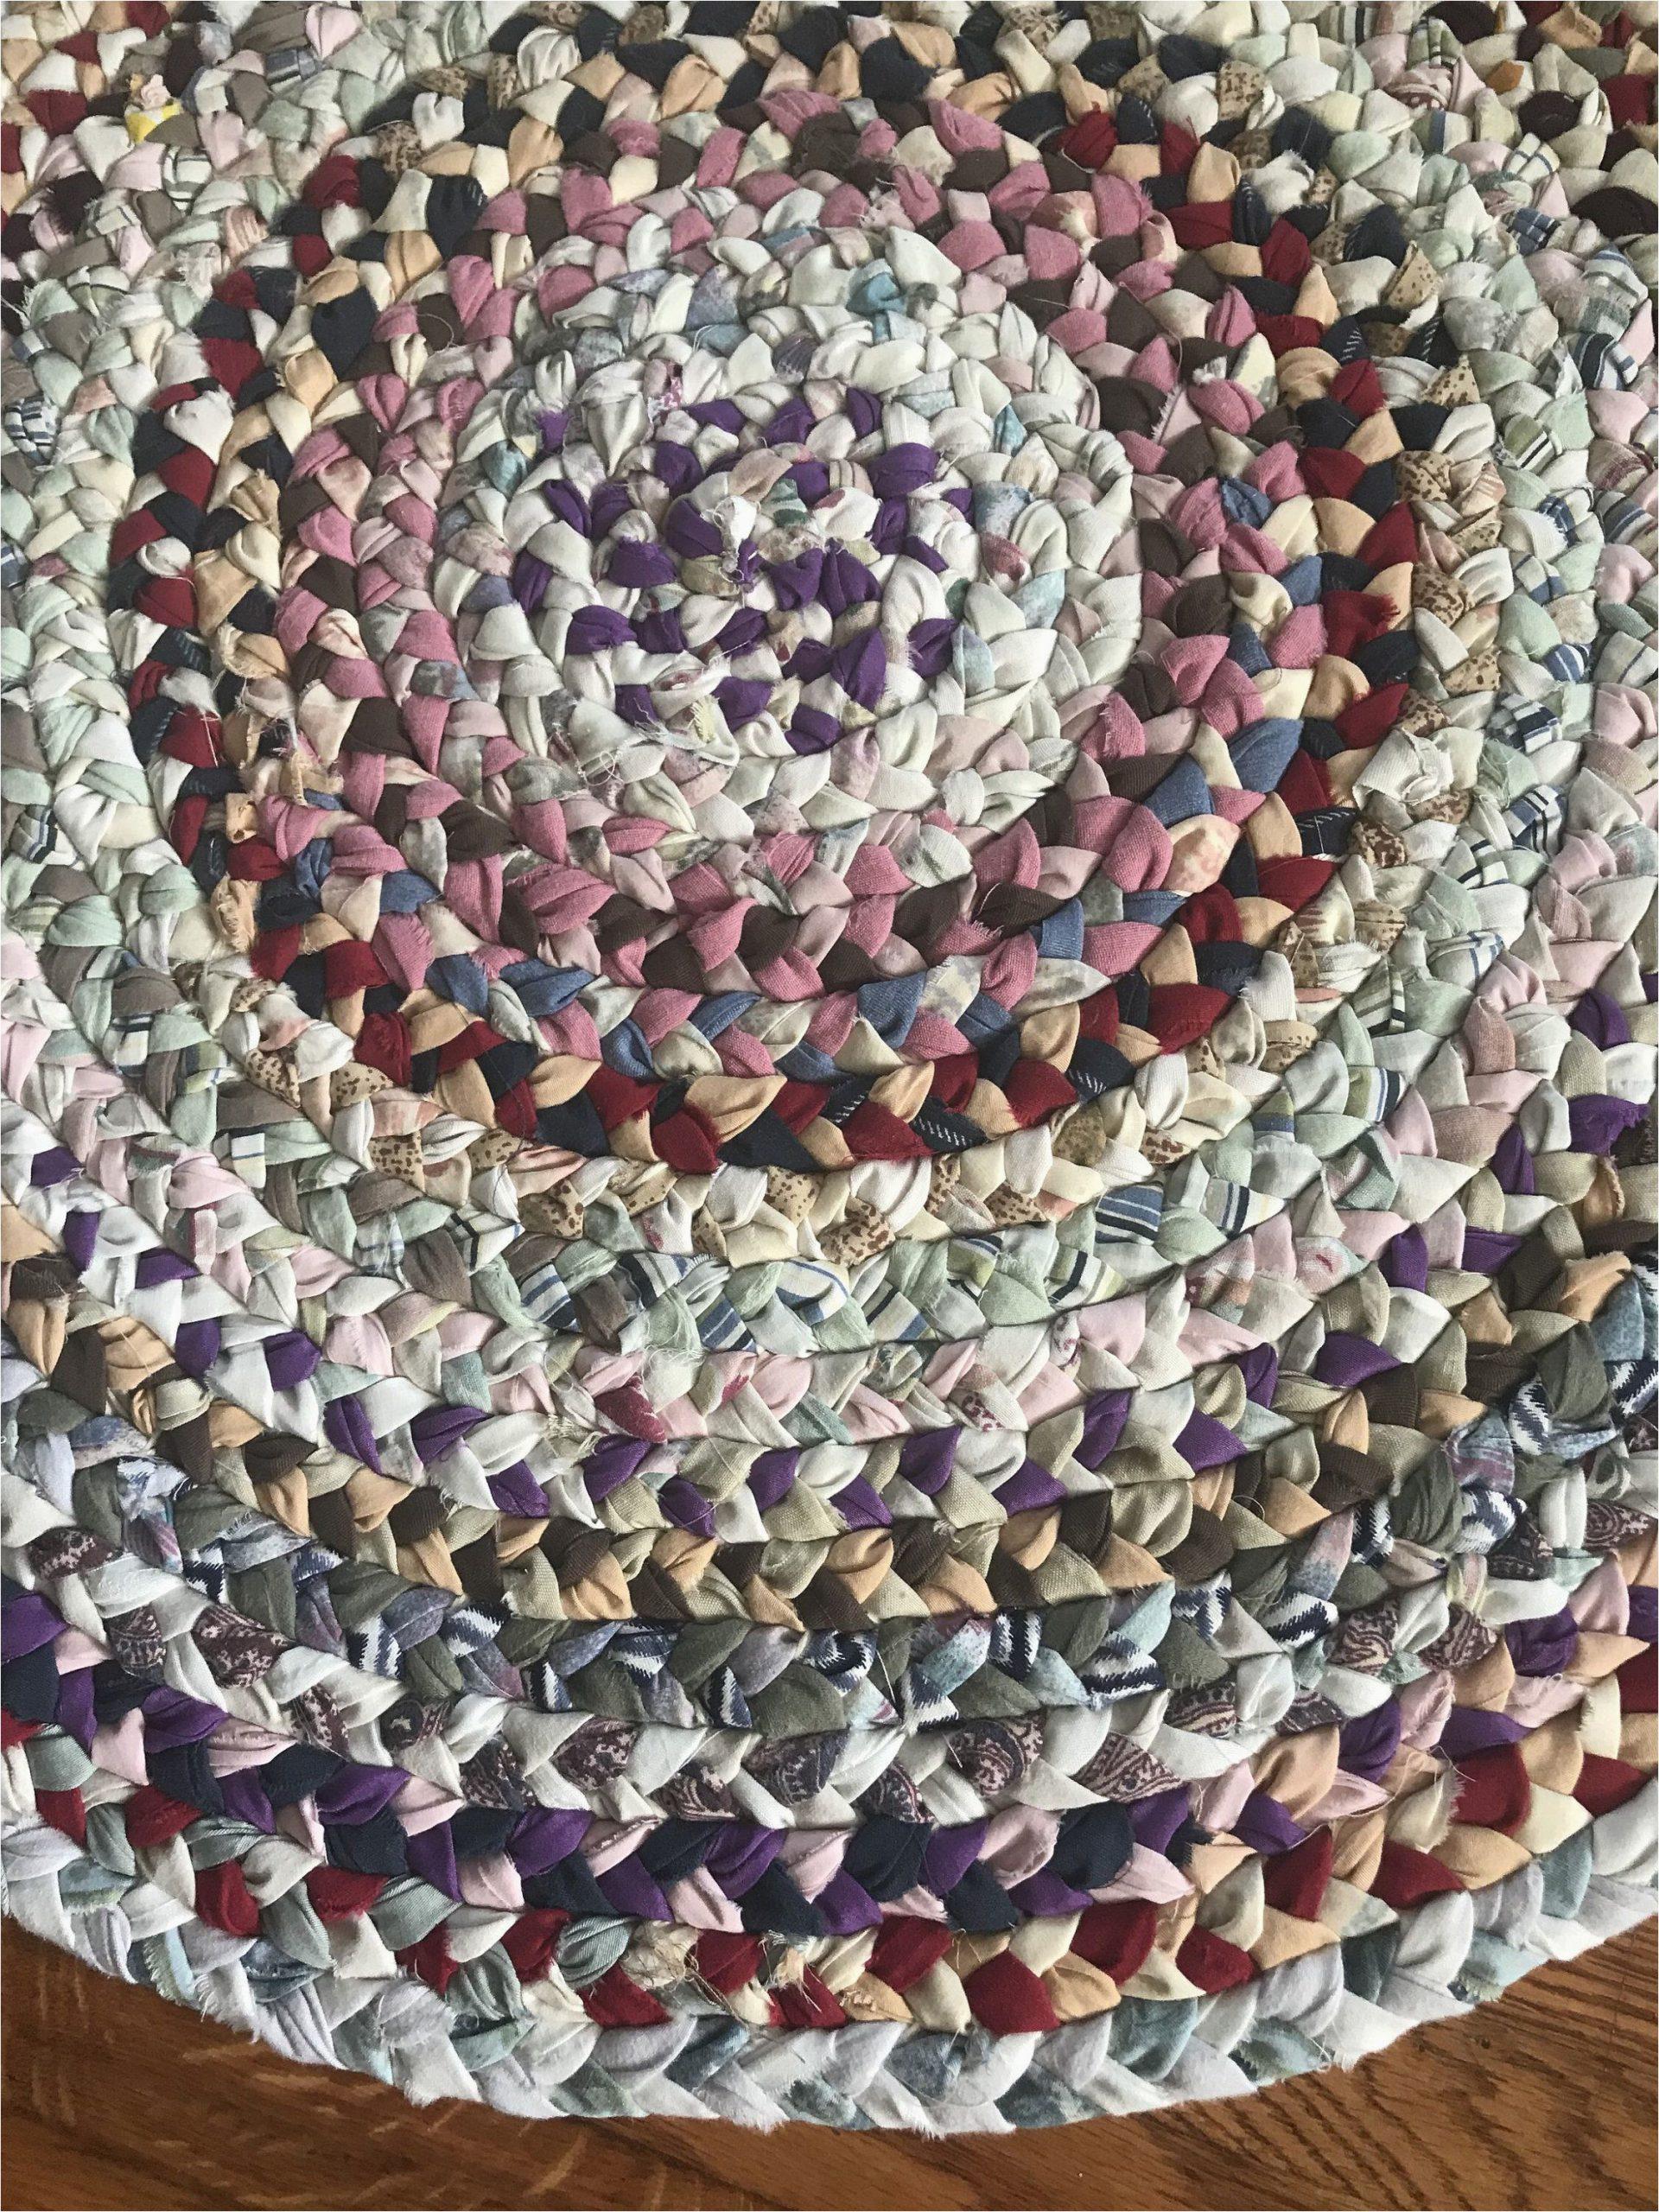 Blue Ridge Braided Rugs Pin On Braided Rugs